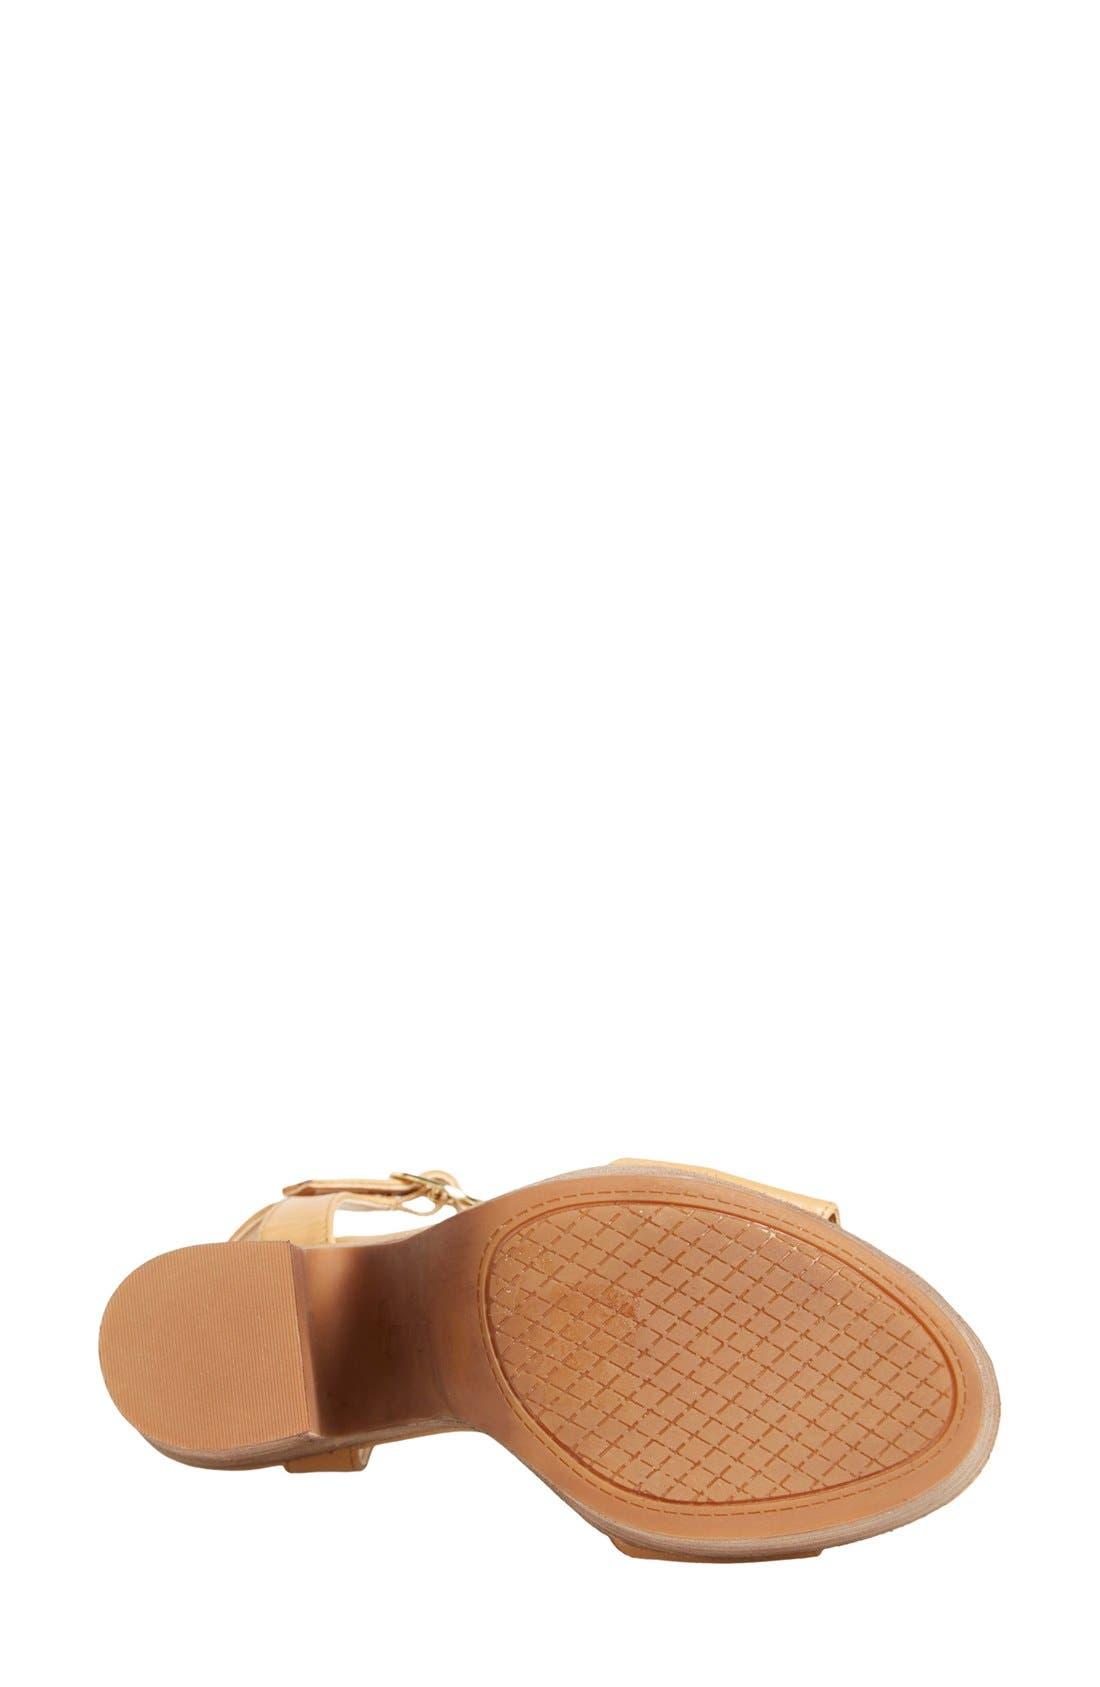 'Whirl' Platform Sandal,                             Alternate thumbnail 4, color,                             281